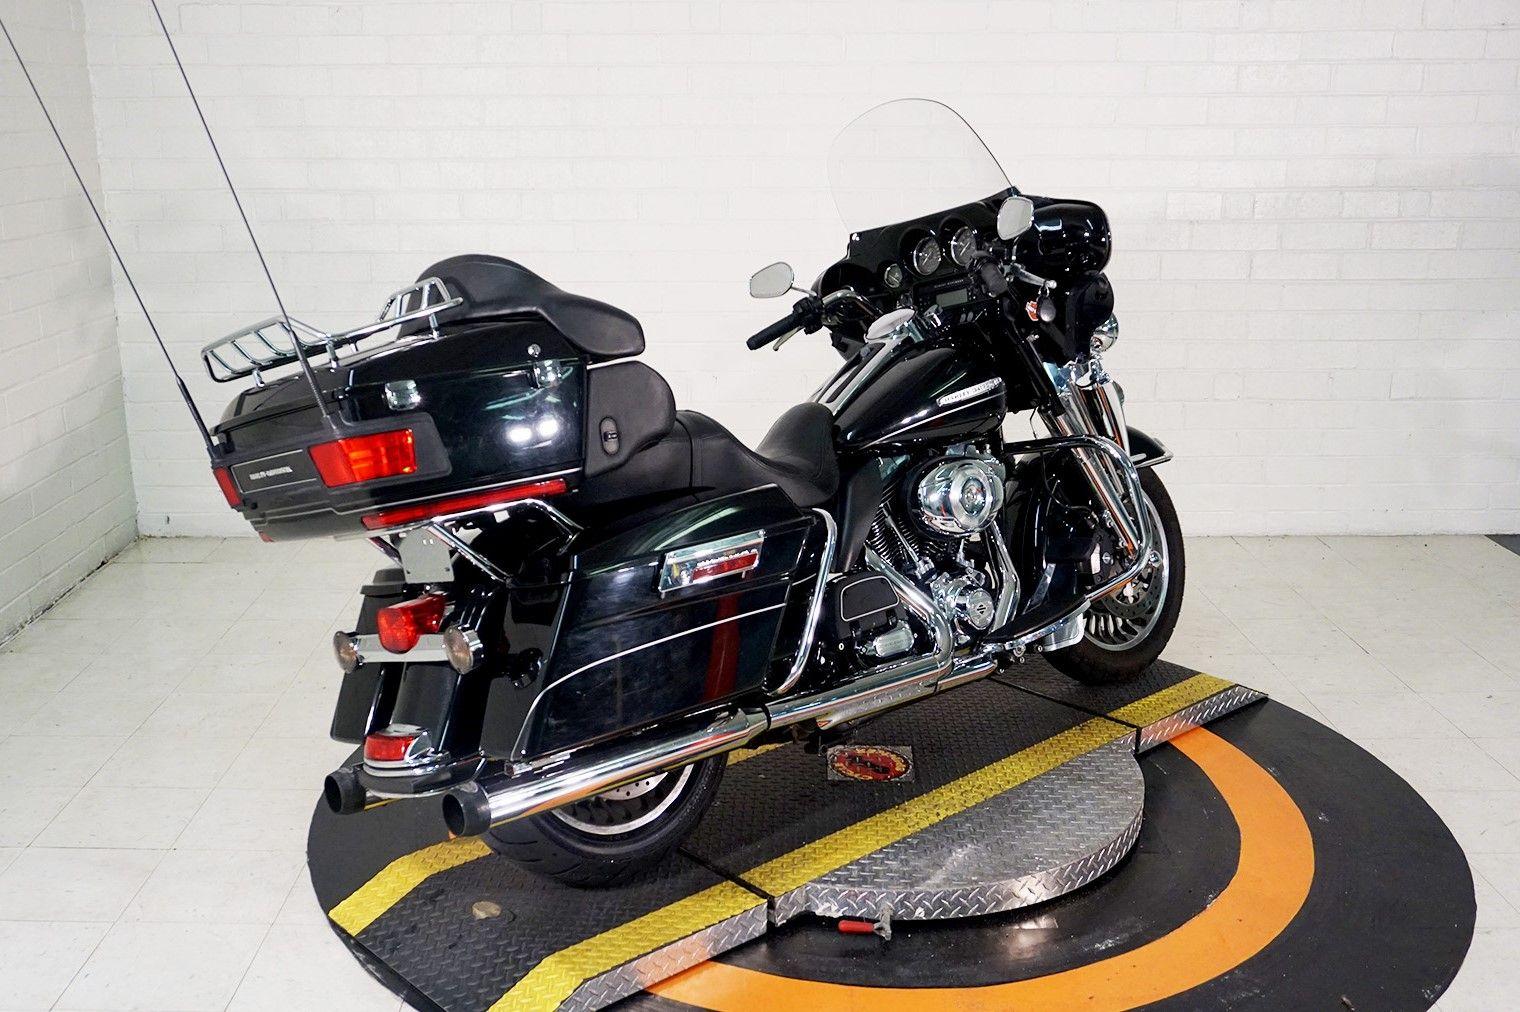 Pre-Owned 2012 Harley-Davidson Electra Glide Ultra Limited